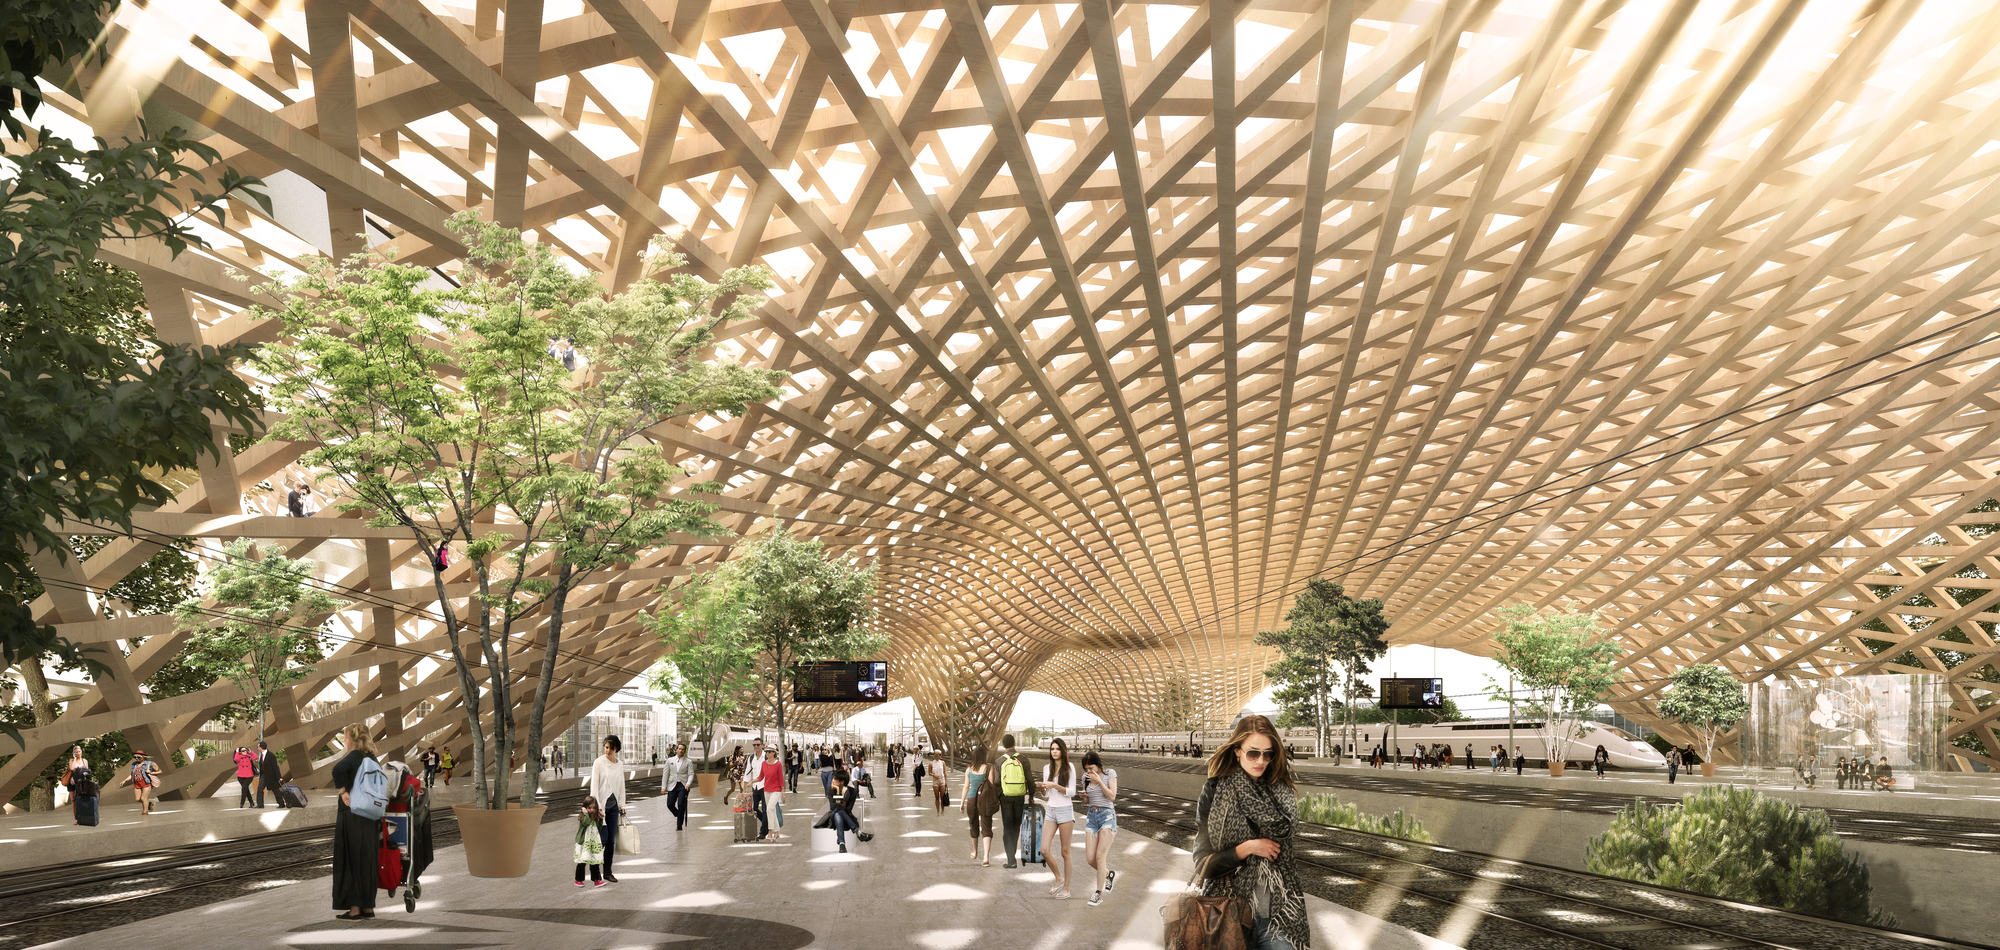 Transit Station Architecture